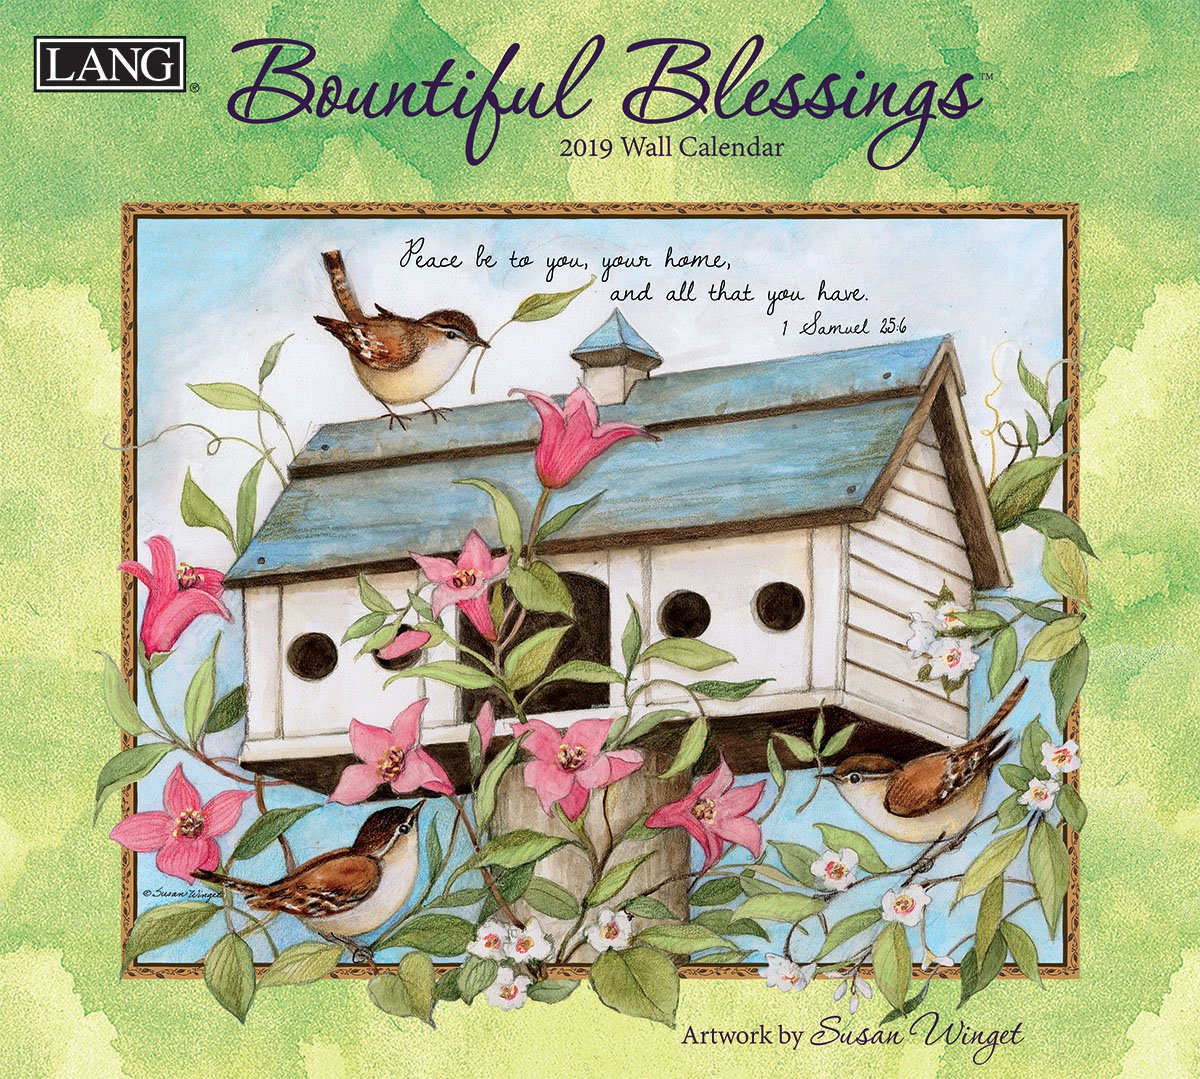 The Lang Companies Bountiful Blessings 2019 Wall Calendar (19991001897)